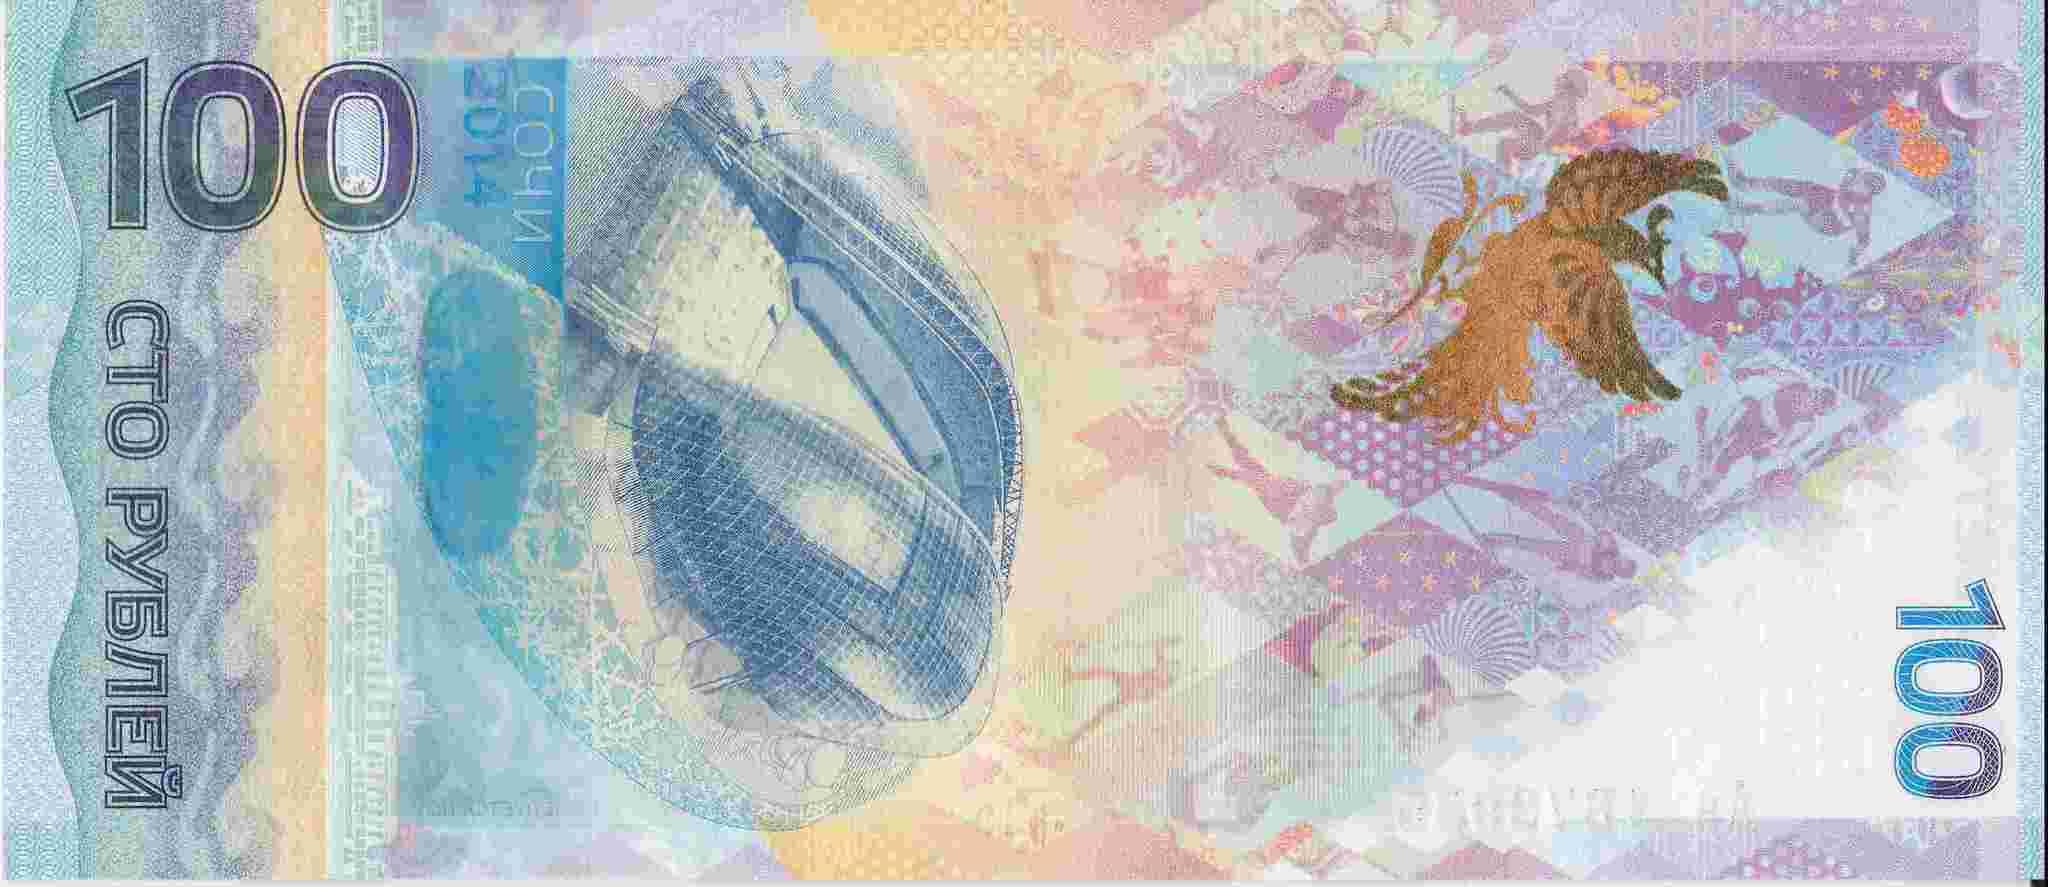 Сочи 2014 банкнота 100 рублей серия Аа